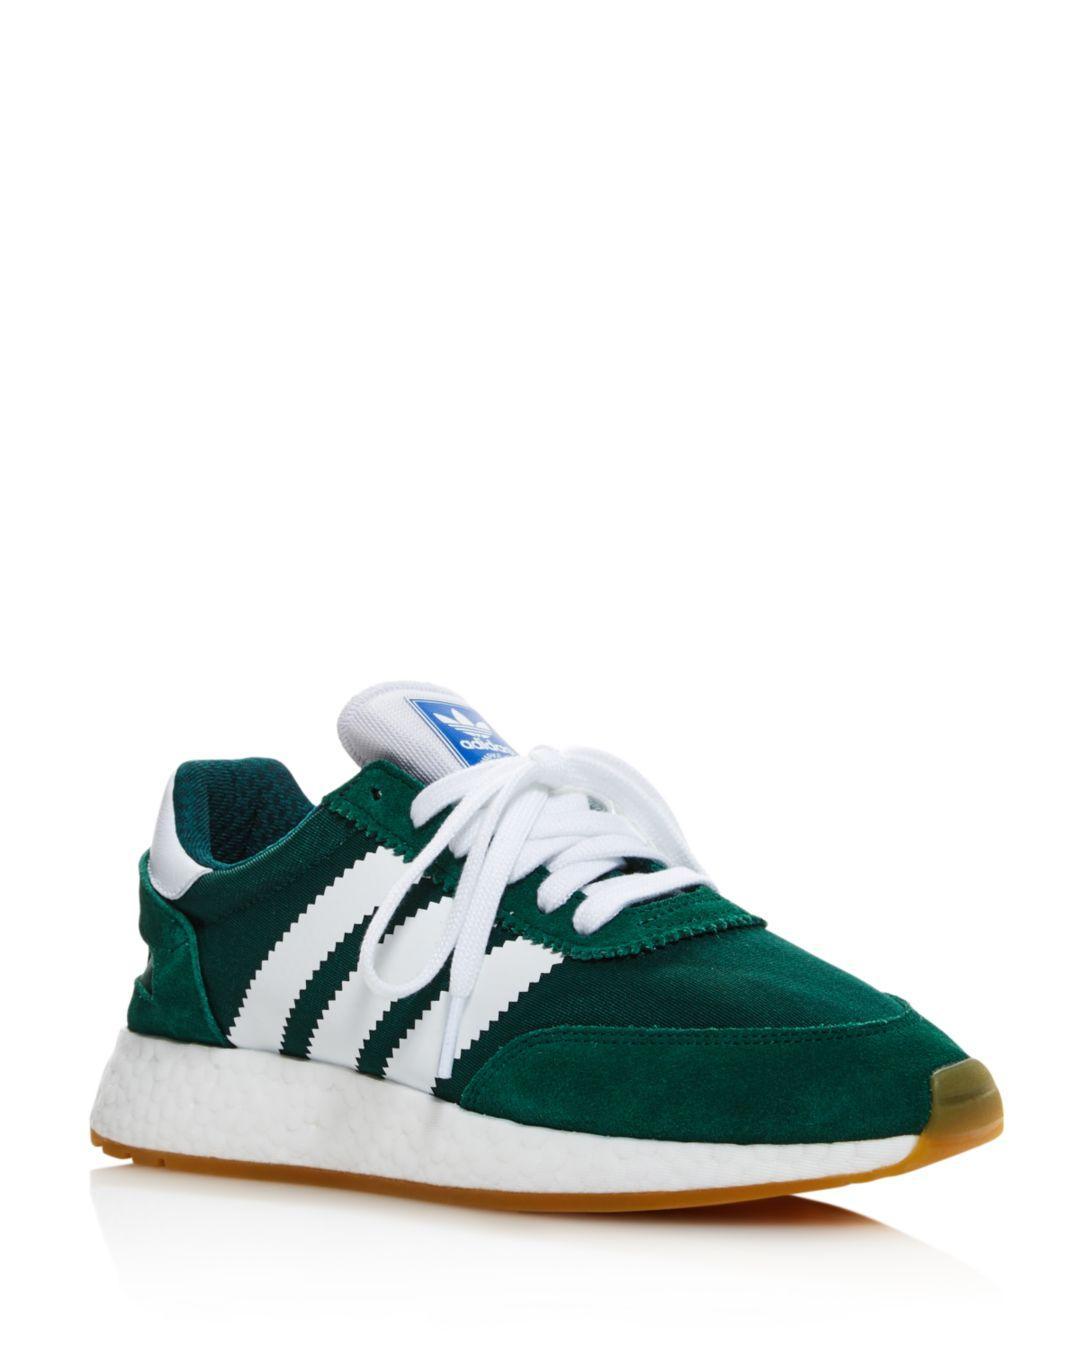 b5fe7093fc Adidas Green Women's I - 5923 Low - Top Sneakers